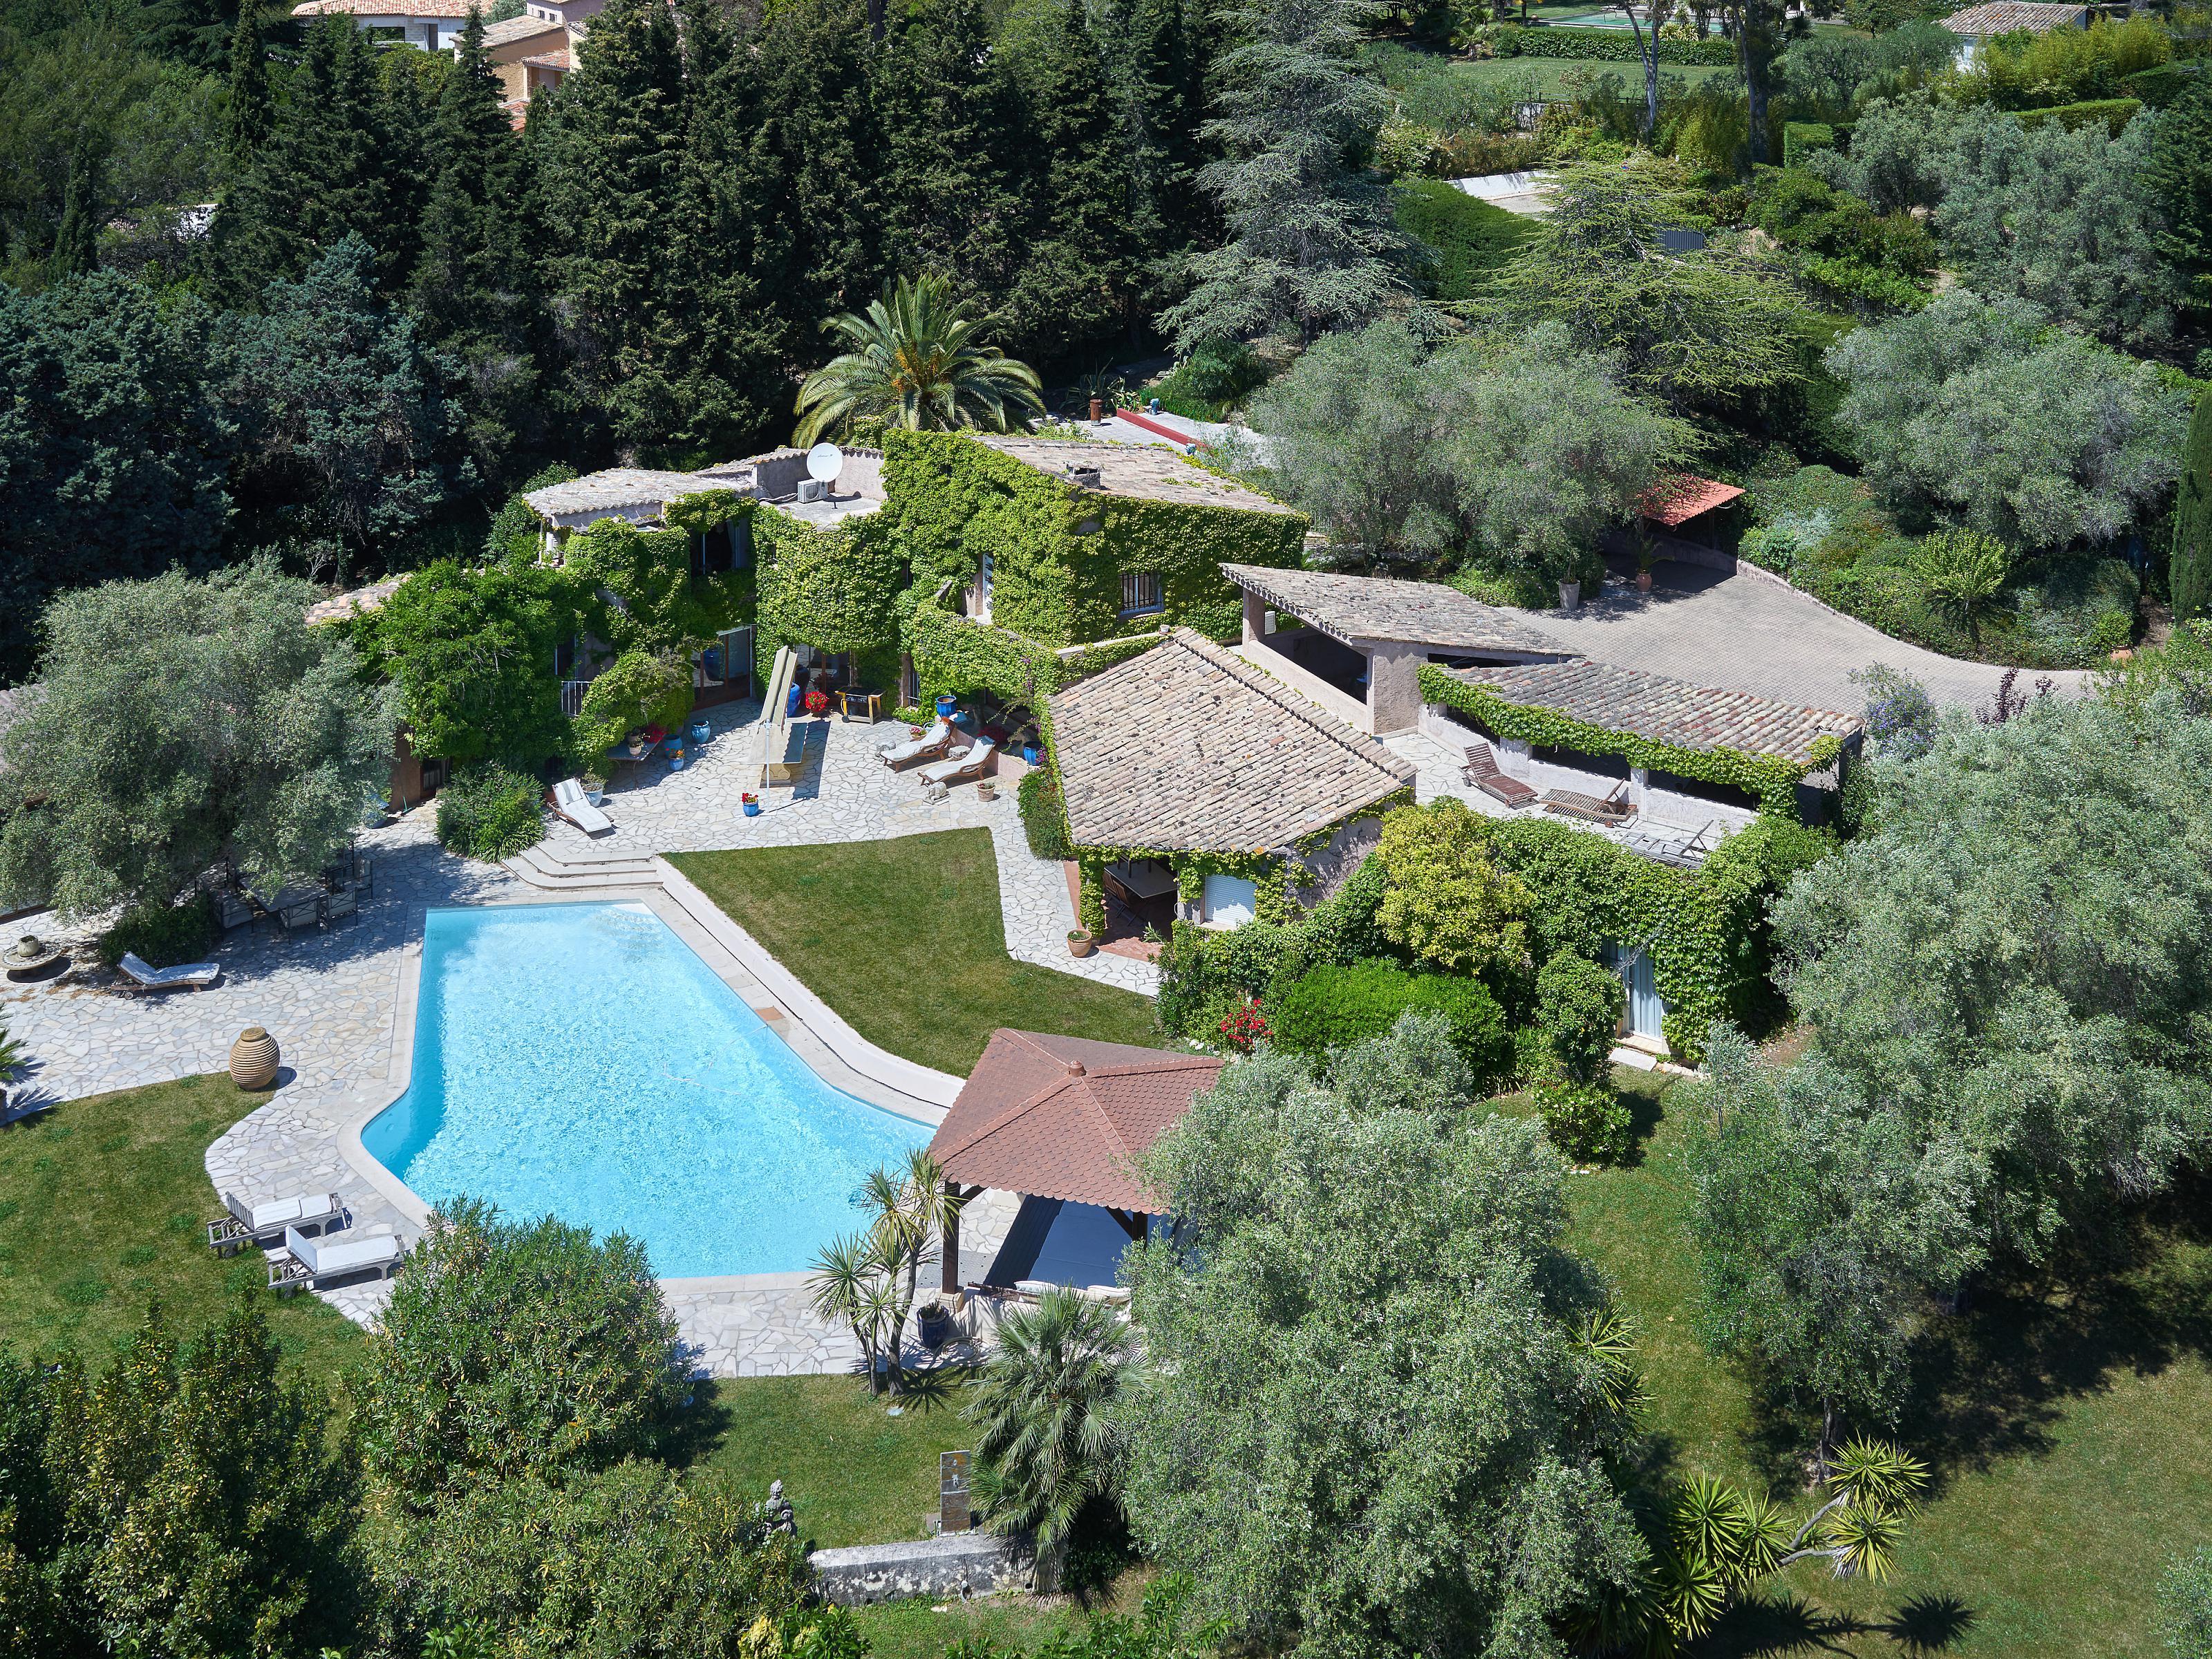 独户住宅 为 销售 在 Luxury property for sale - best deal of Mougins Mougins, 普罗旺斯阿尔卑斯蓝色海岸 06250 法国